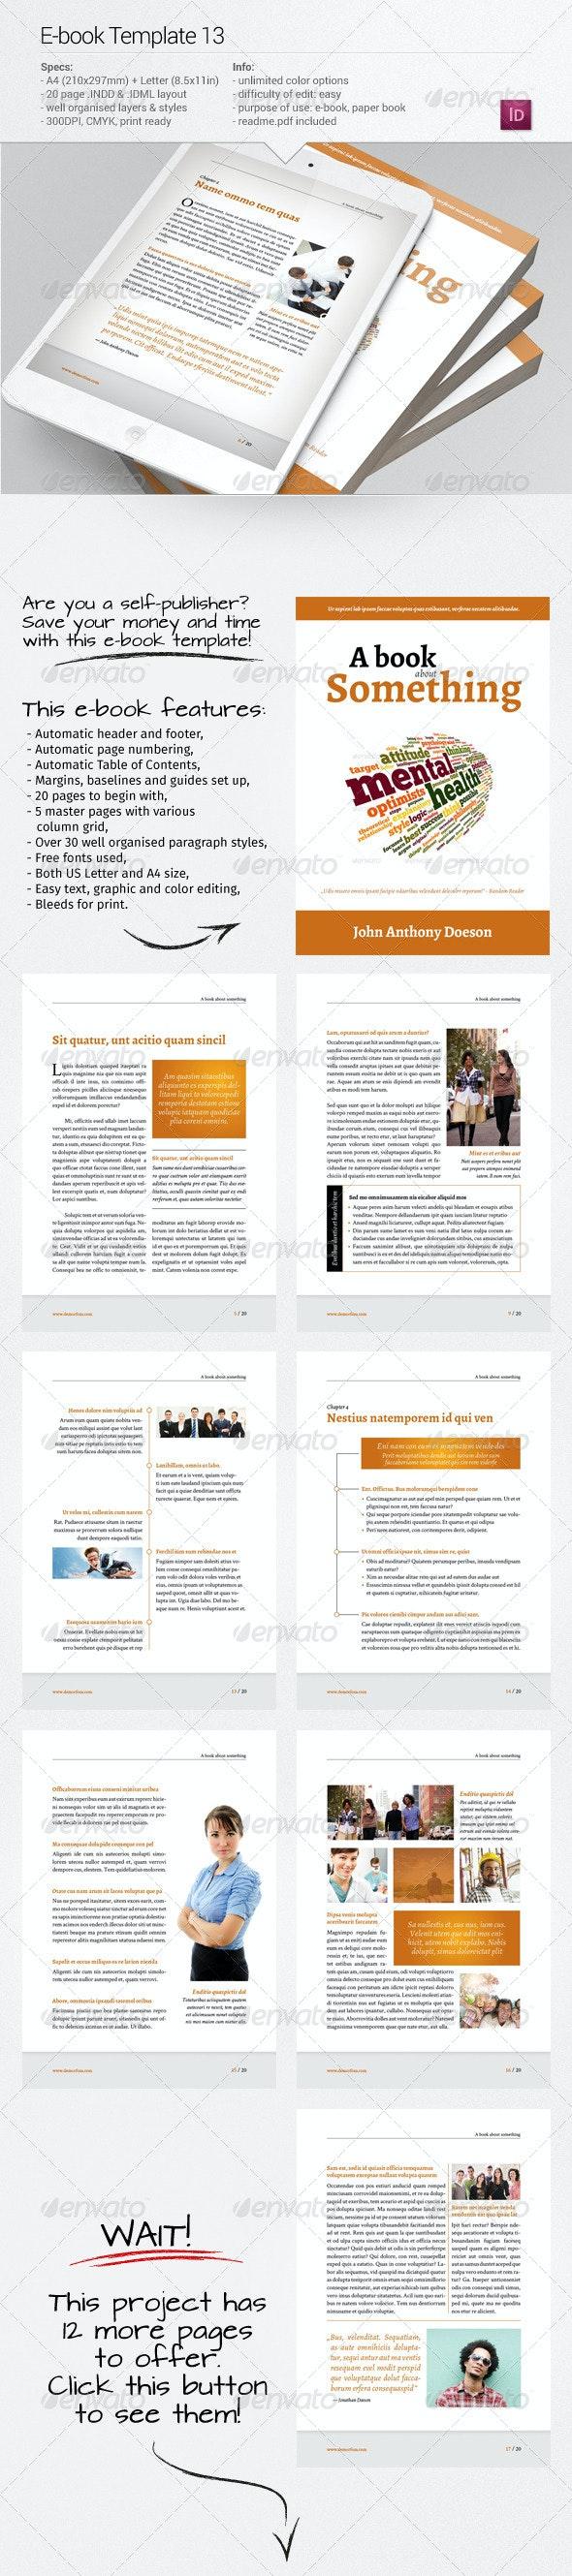 E-book Template 13 - Digital Books ePublishing